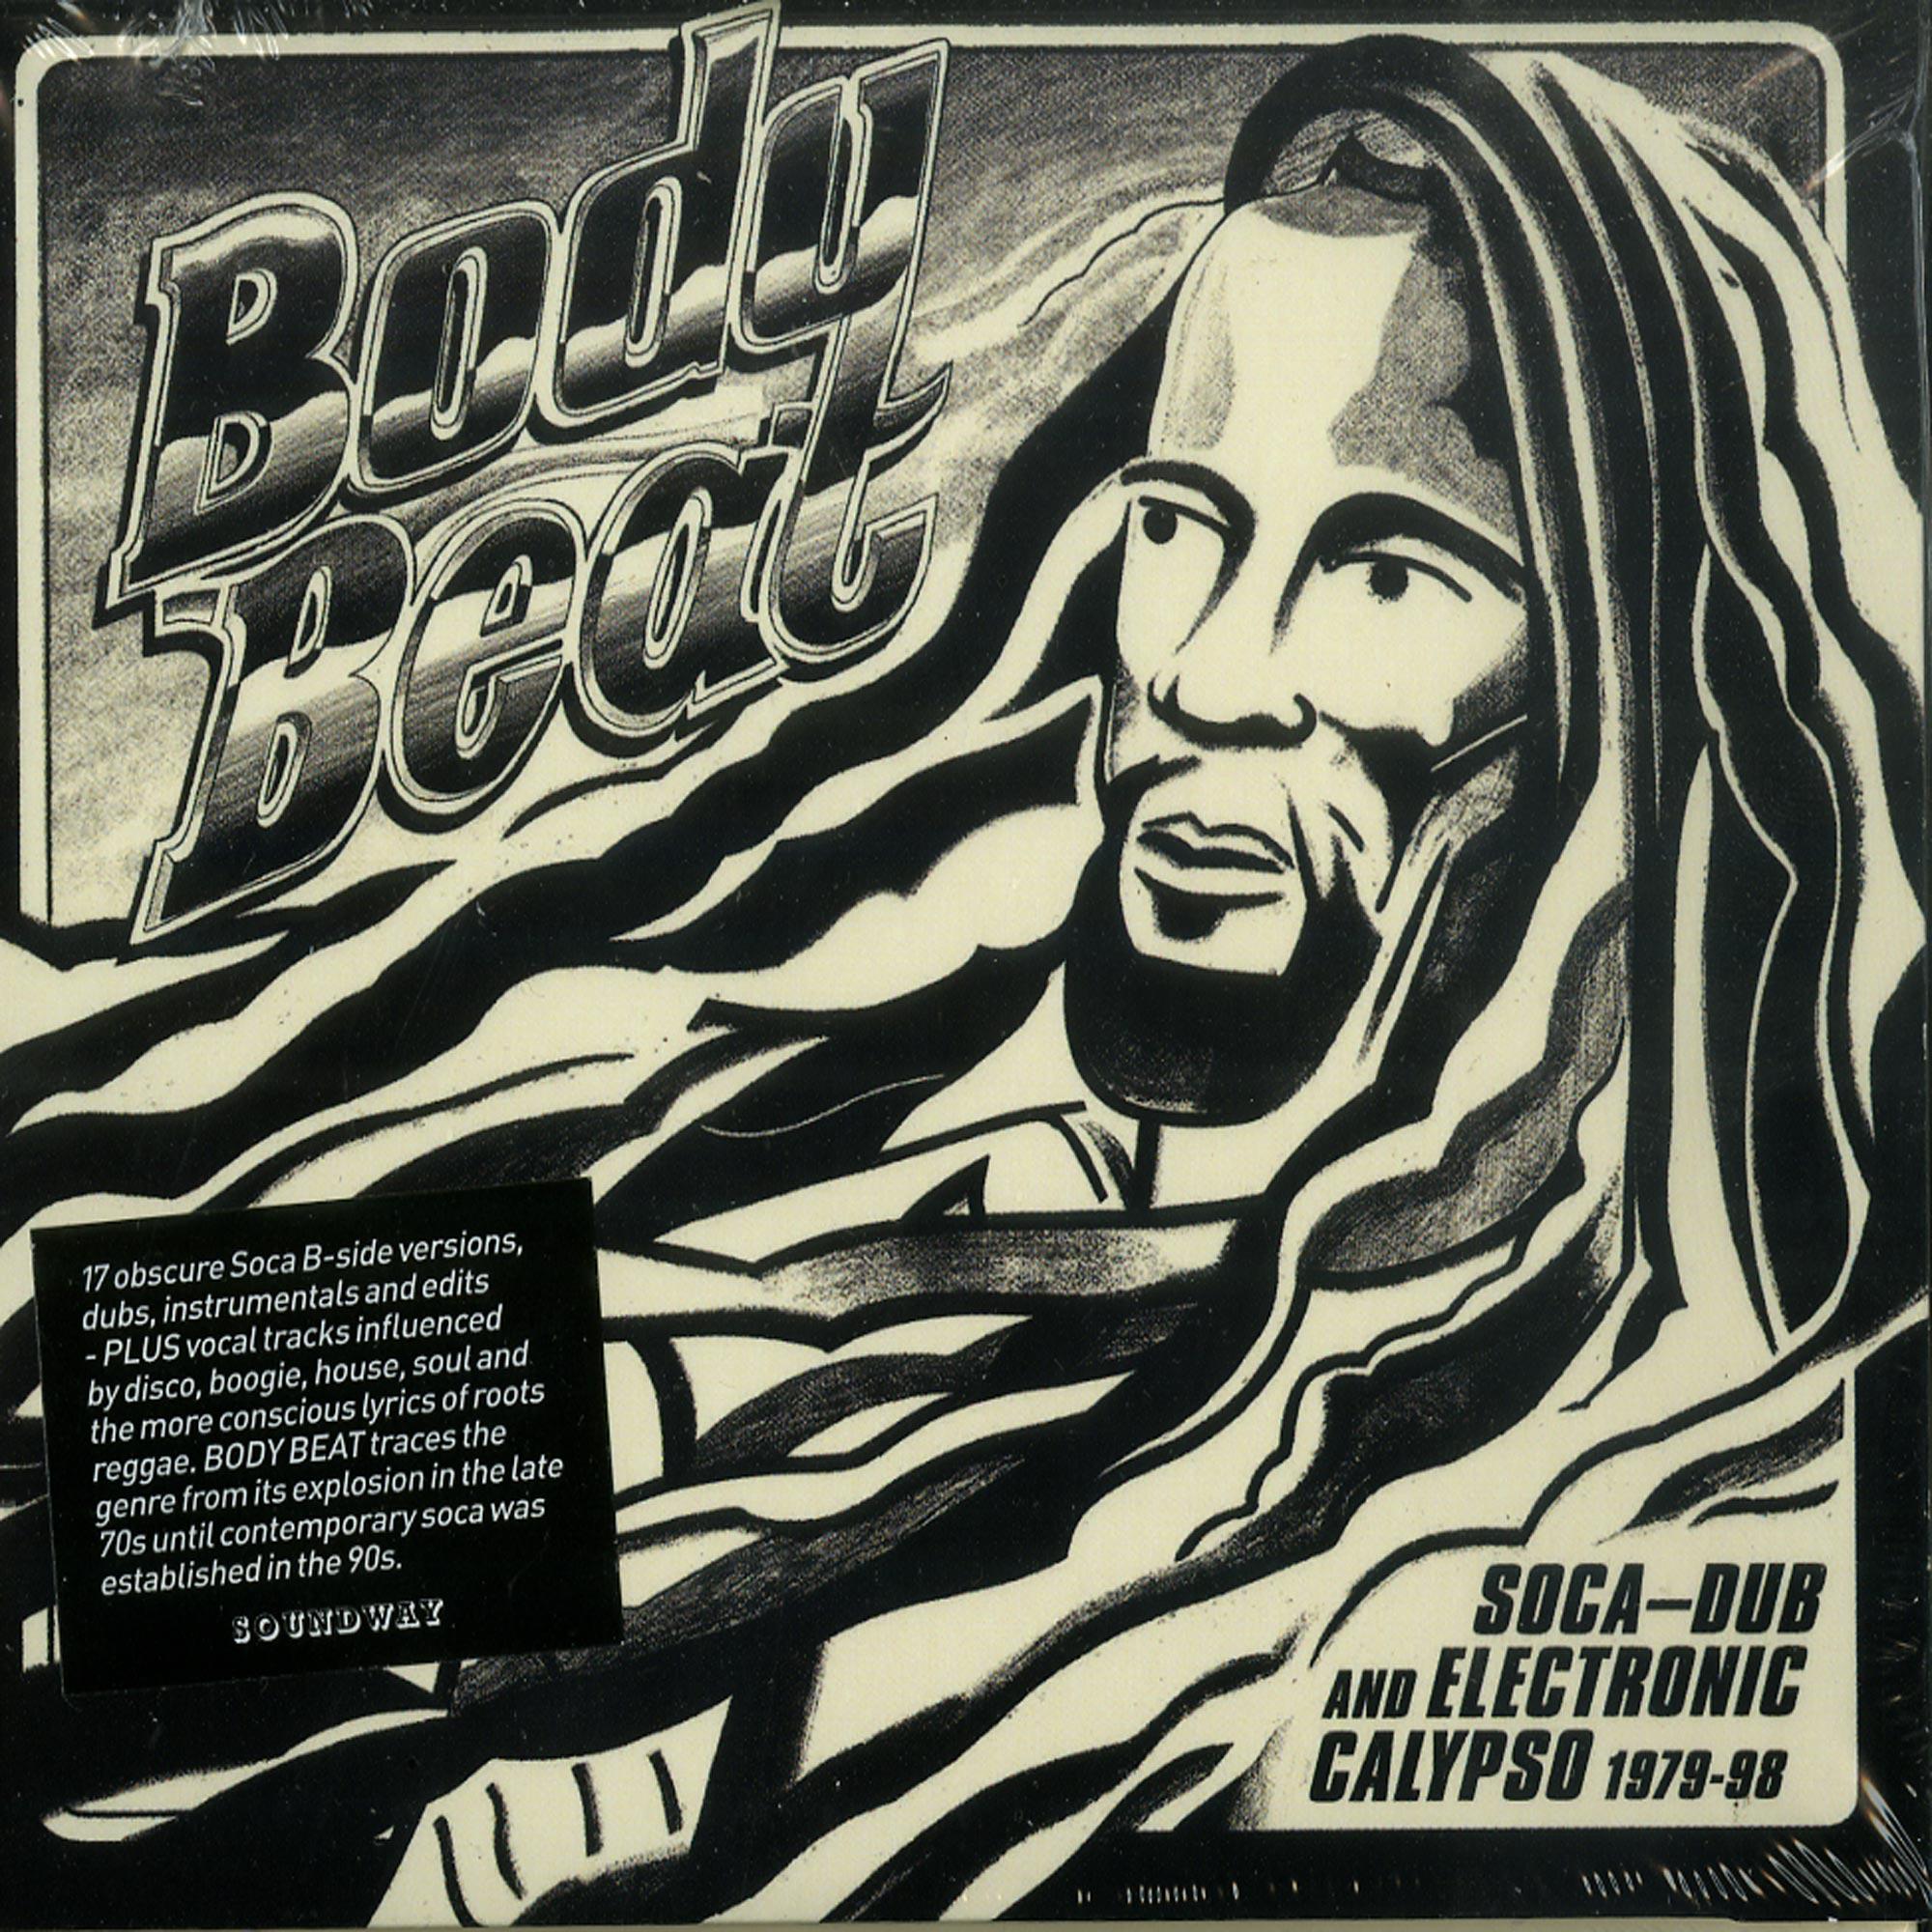 Various Artists - BODY BEAT: SOCA-DUB AND ELECTRONIC CALYPSO 1979-98